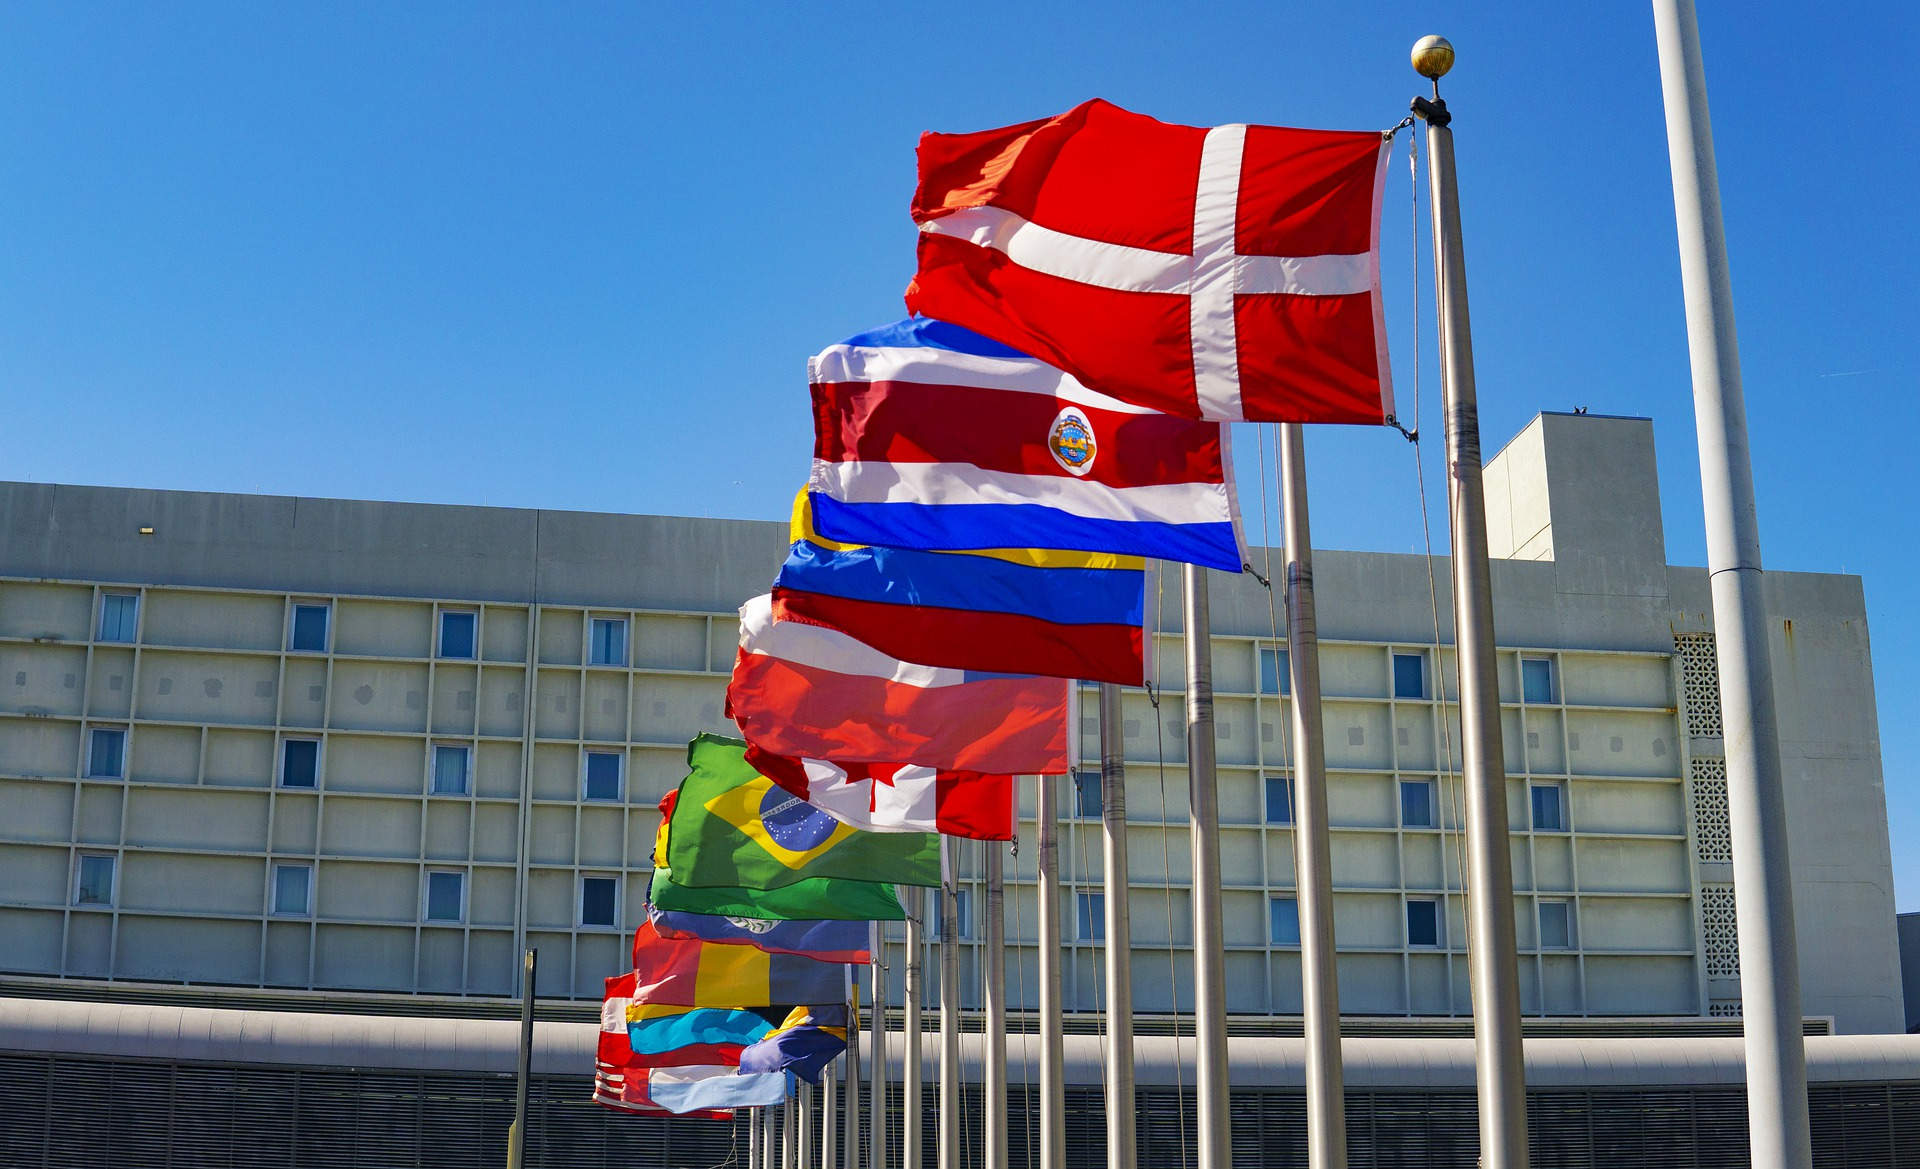 International SEO - internationale Suchmaschinenoptimierung  Wann ist international SEO sinnvoll?